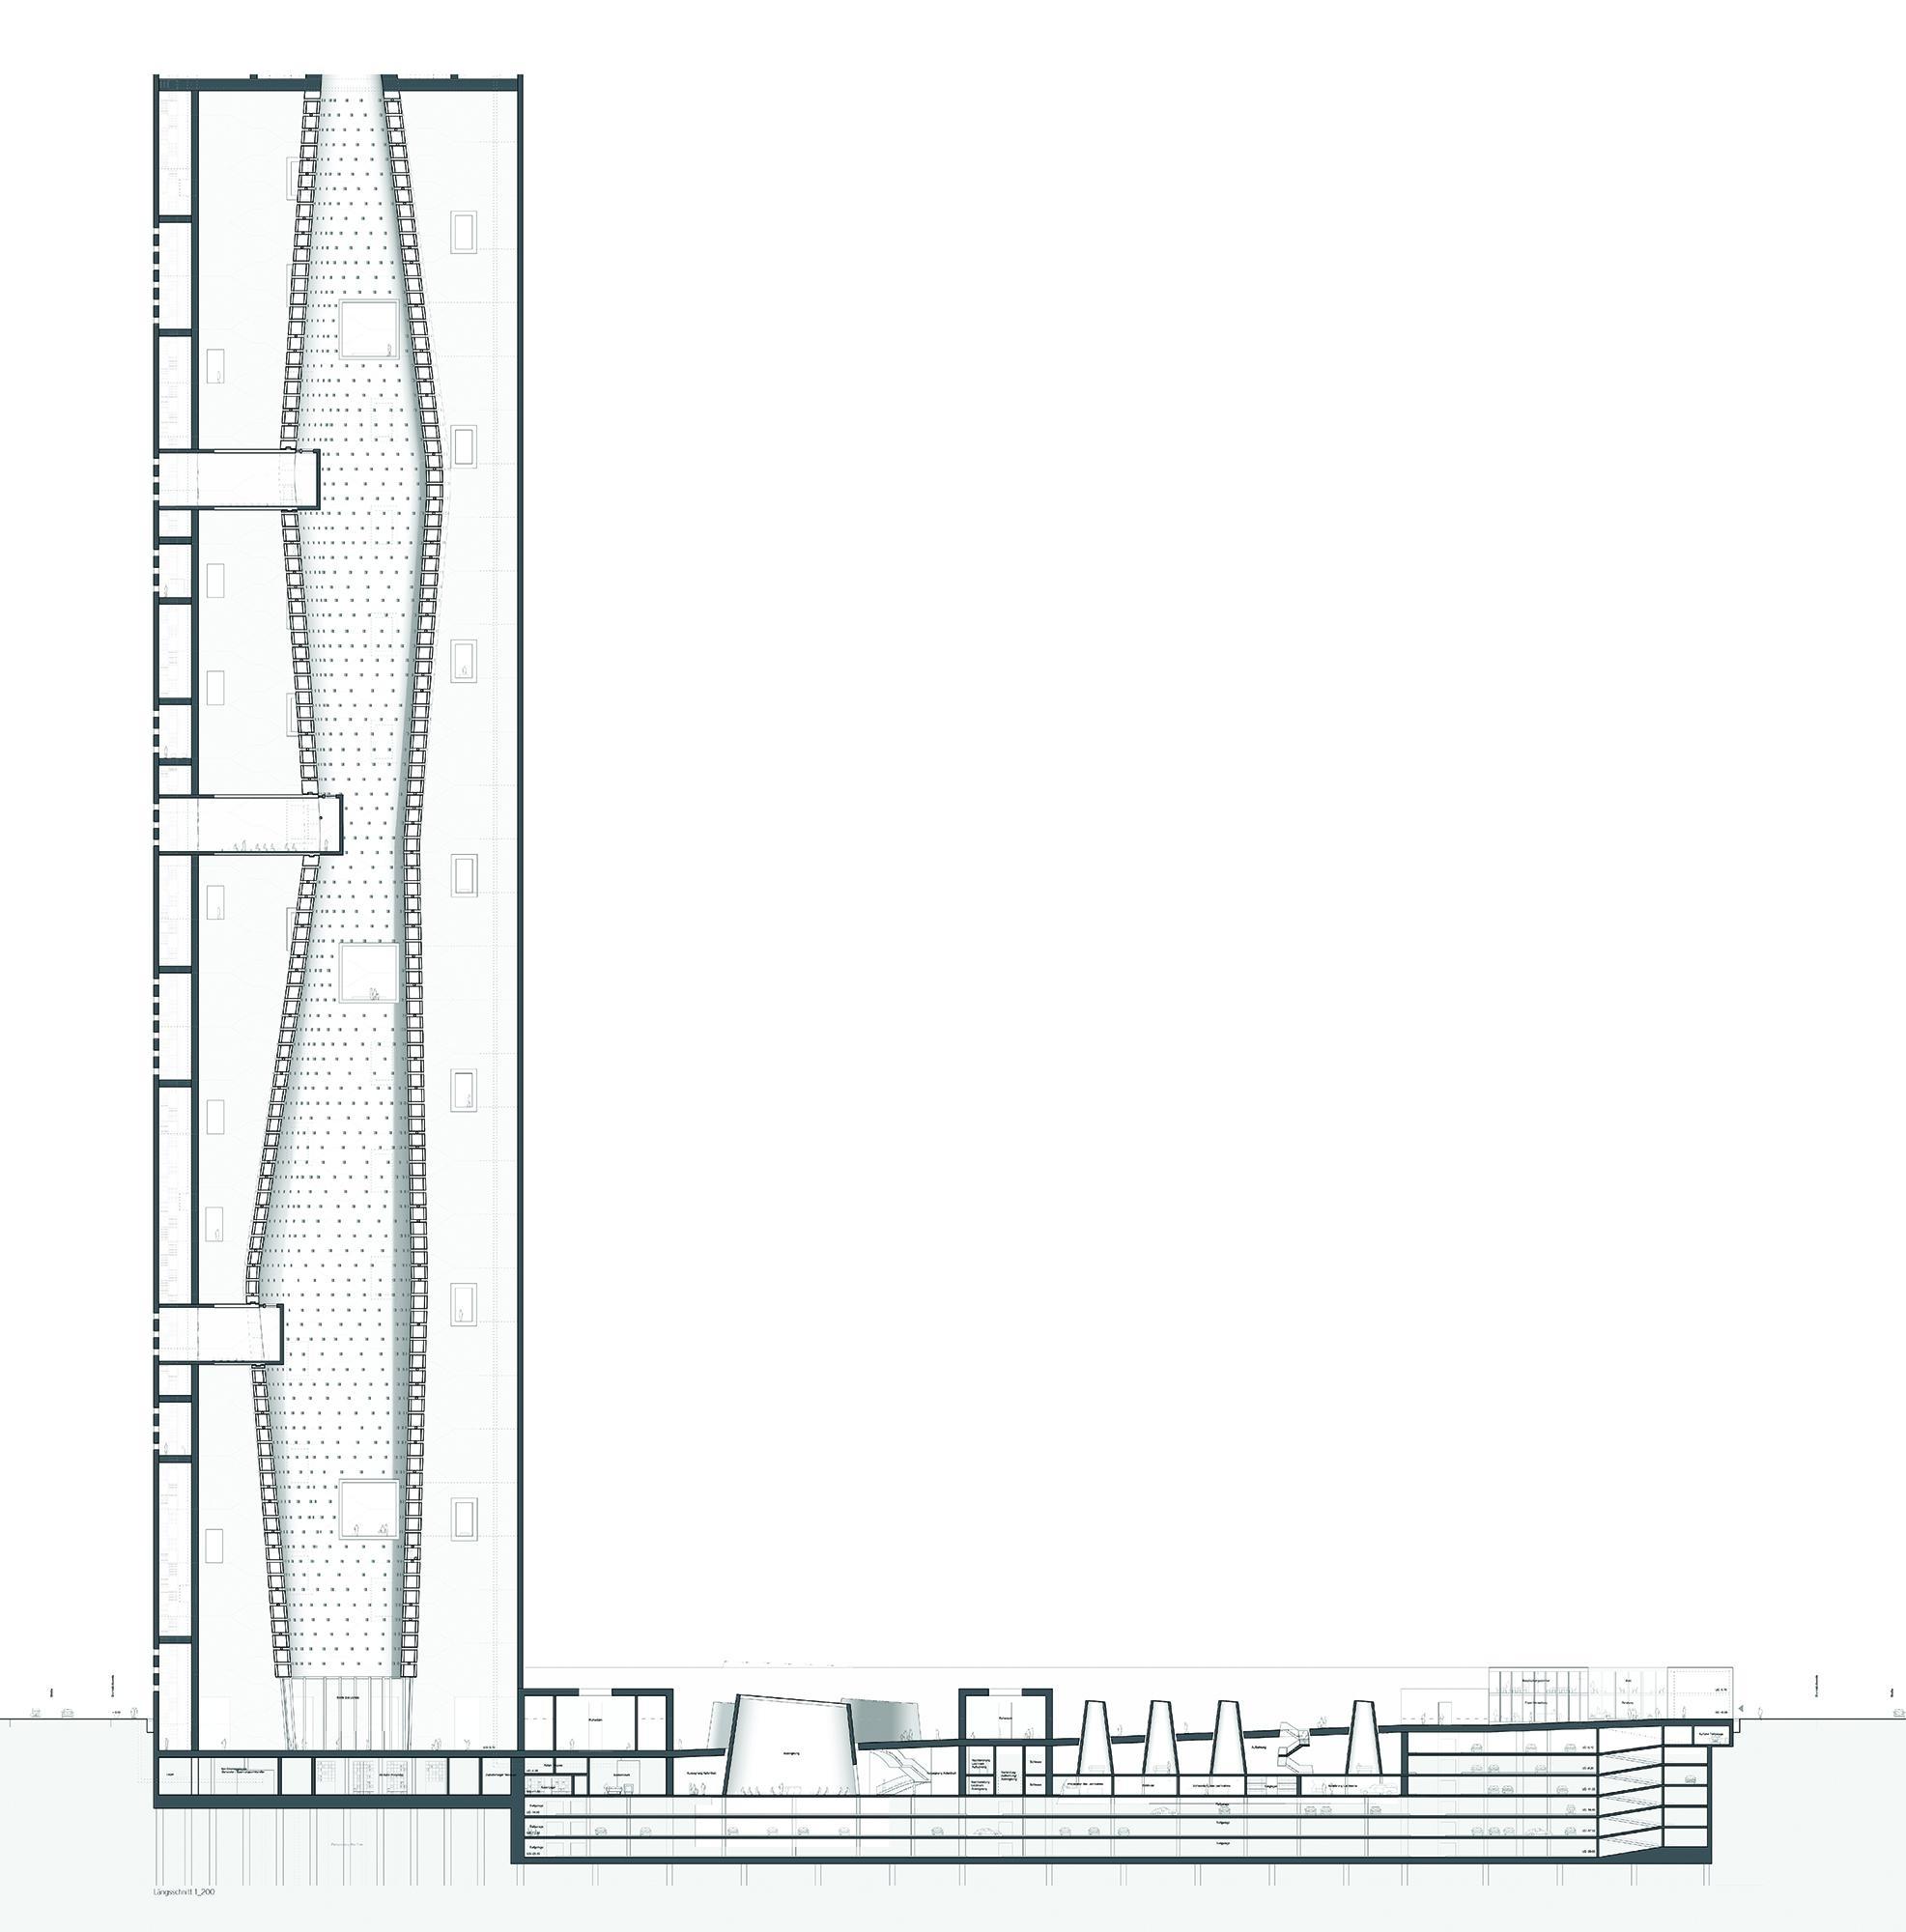 Architektur_offizin-a_Projekte_Kultur_Friedhof_NewYork_11.jpg